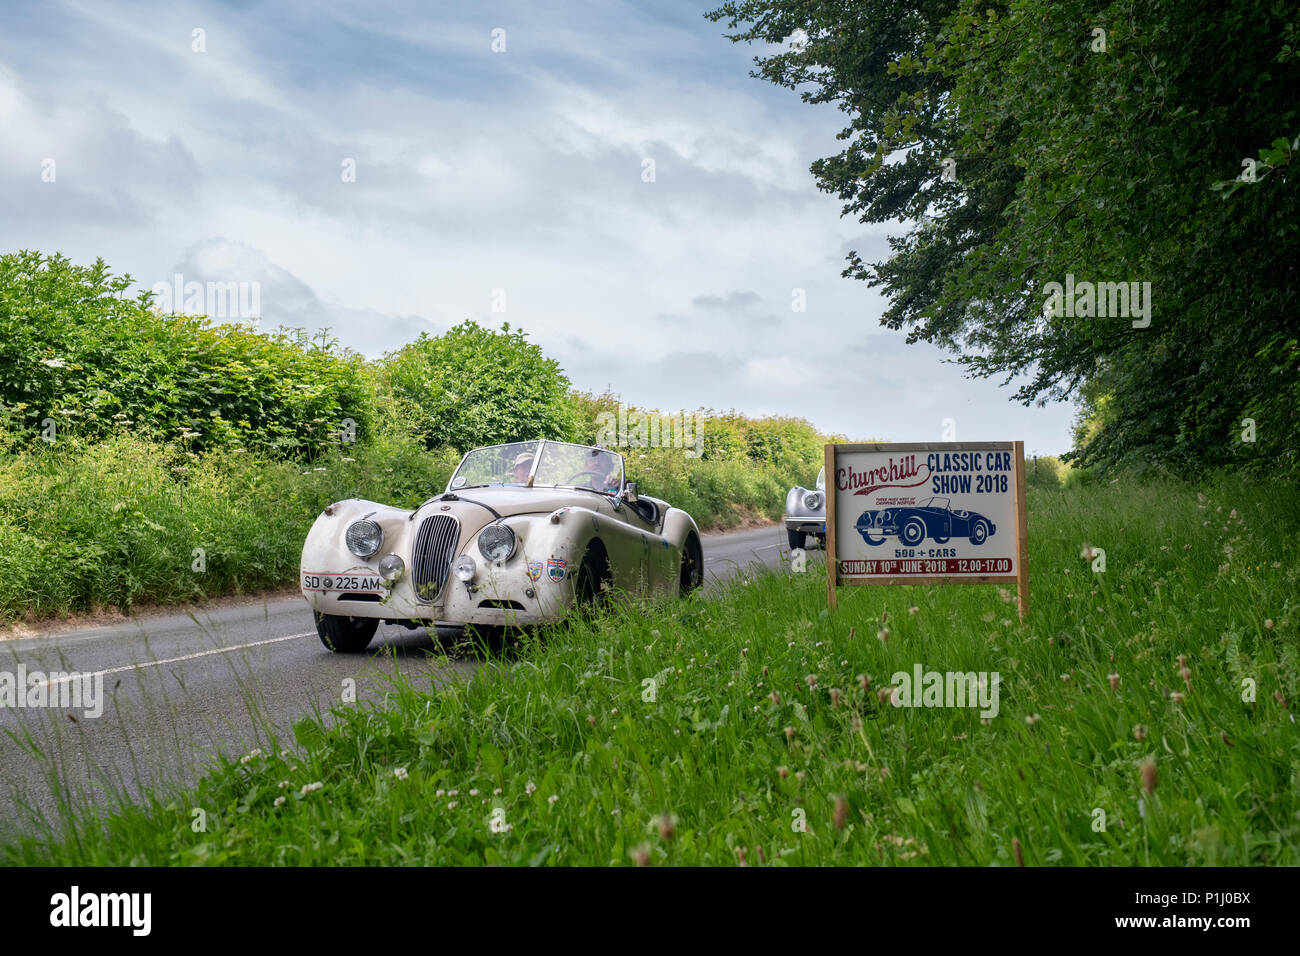 English Vintage Car Shows Stock Photos English Vintage Car Shows - Next car show near me